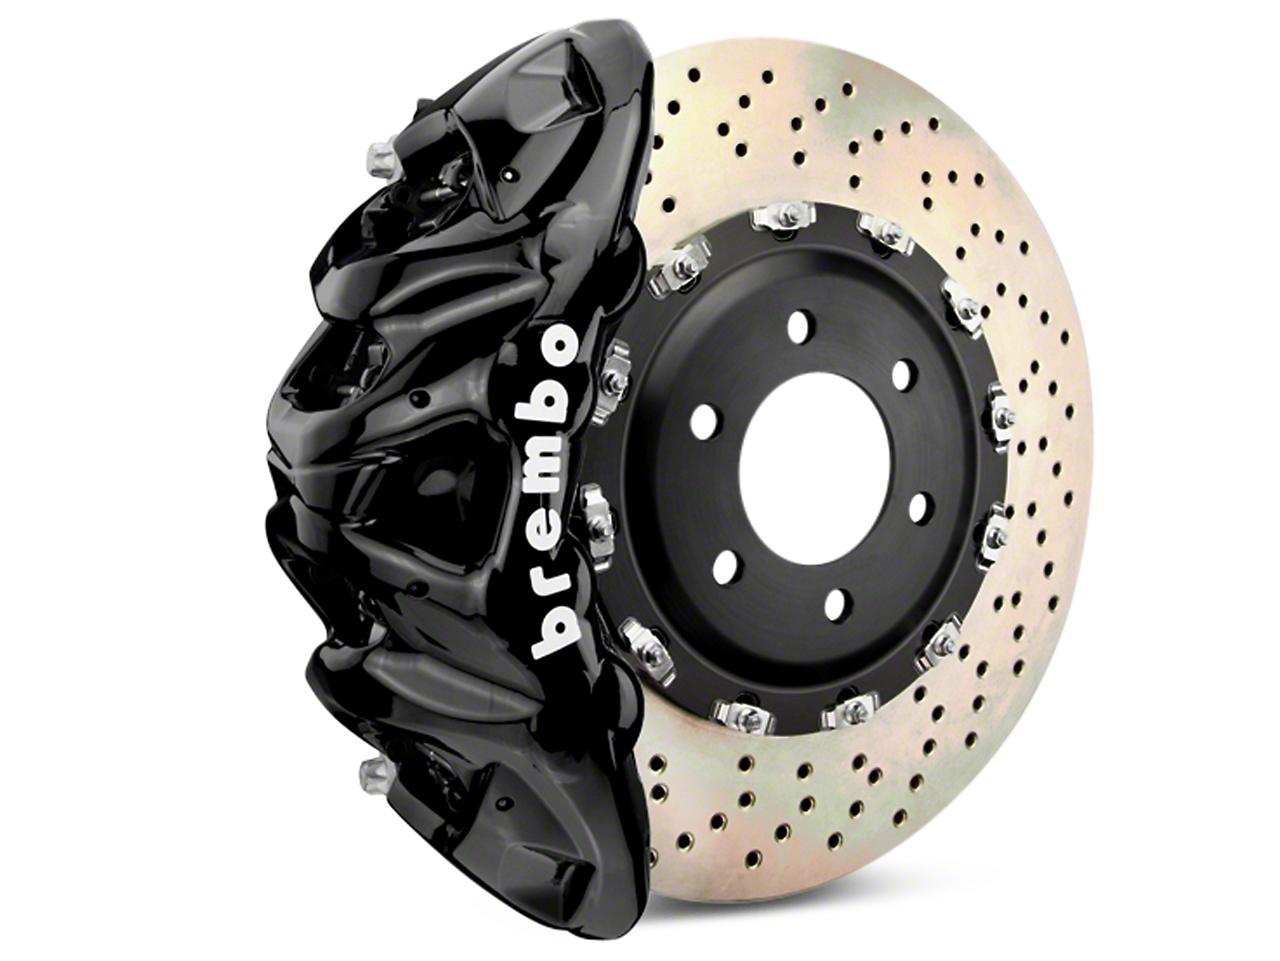 Brembo GT Series 8-Piston Front Brake Kit - 2-Piece Cross Drilled Rotors - Black (07-18 Silverado 1500)